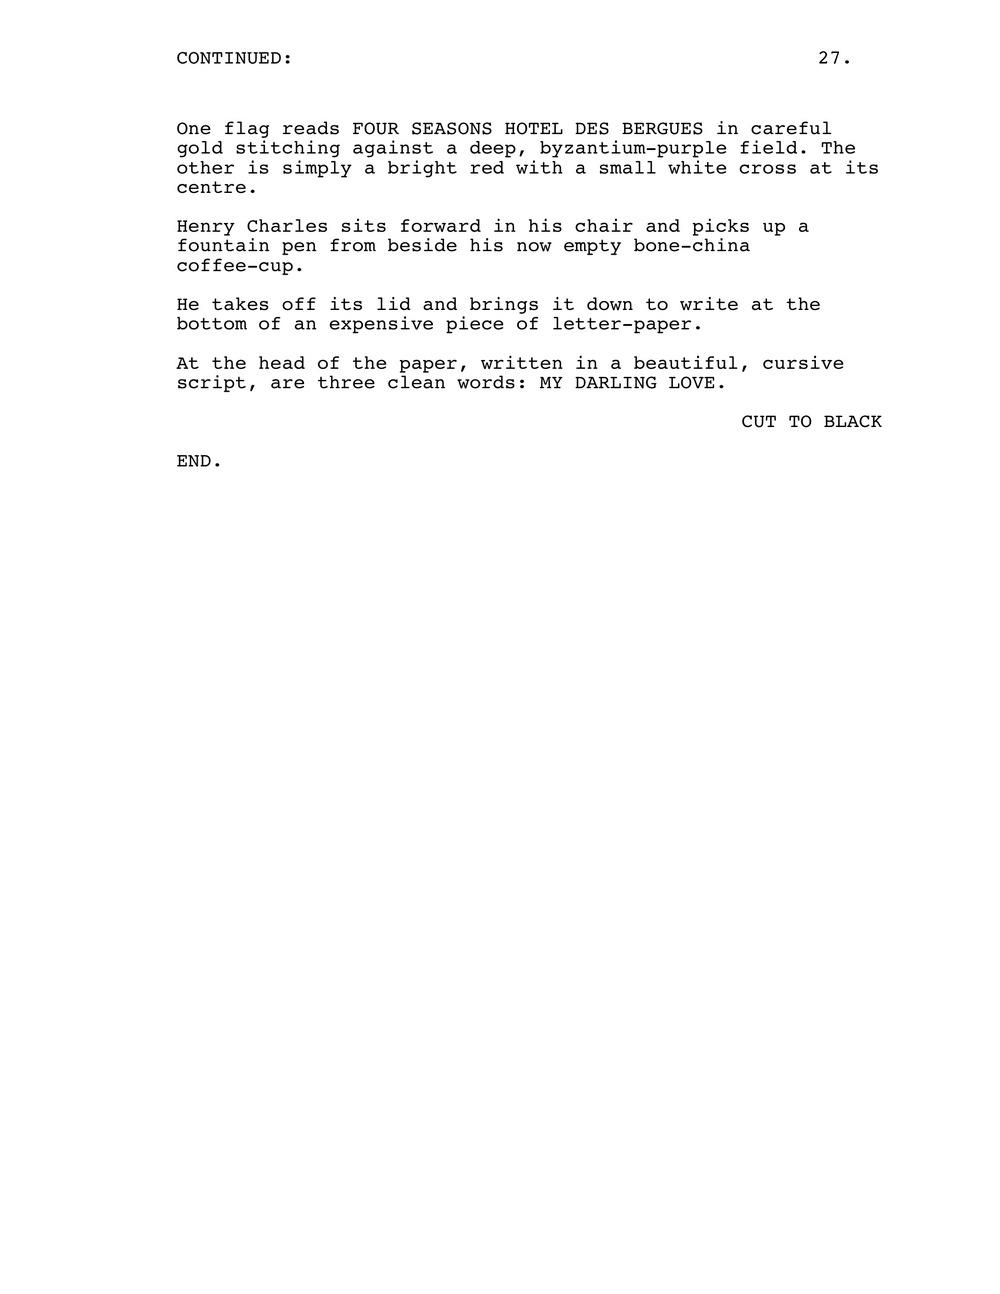 'Introducing Henry Charles' (Pilot) by Alexander Craig | 27.jpeg